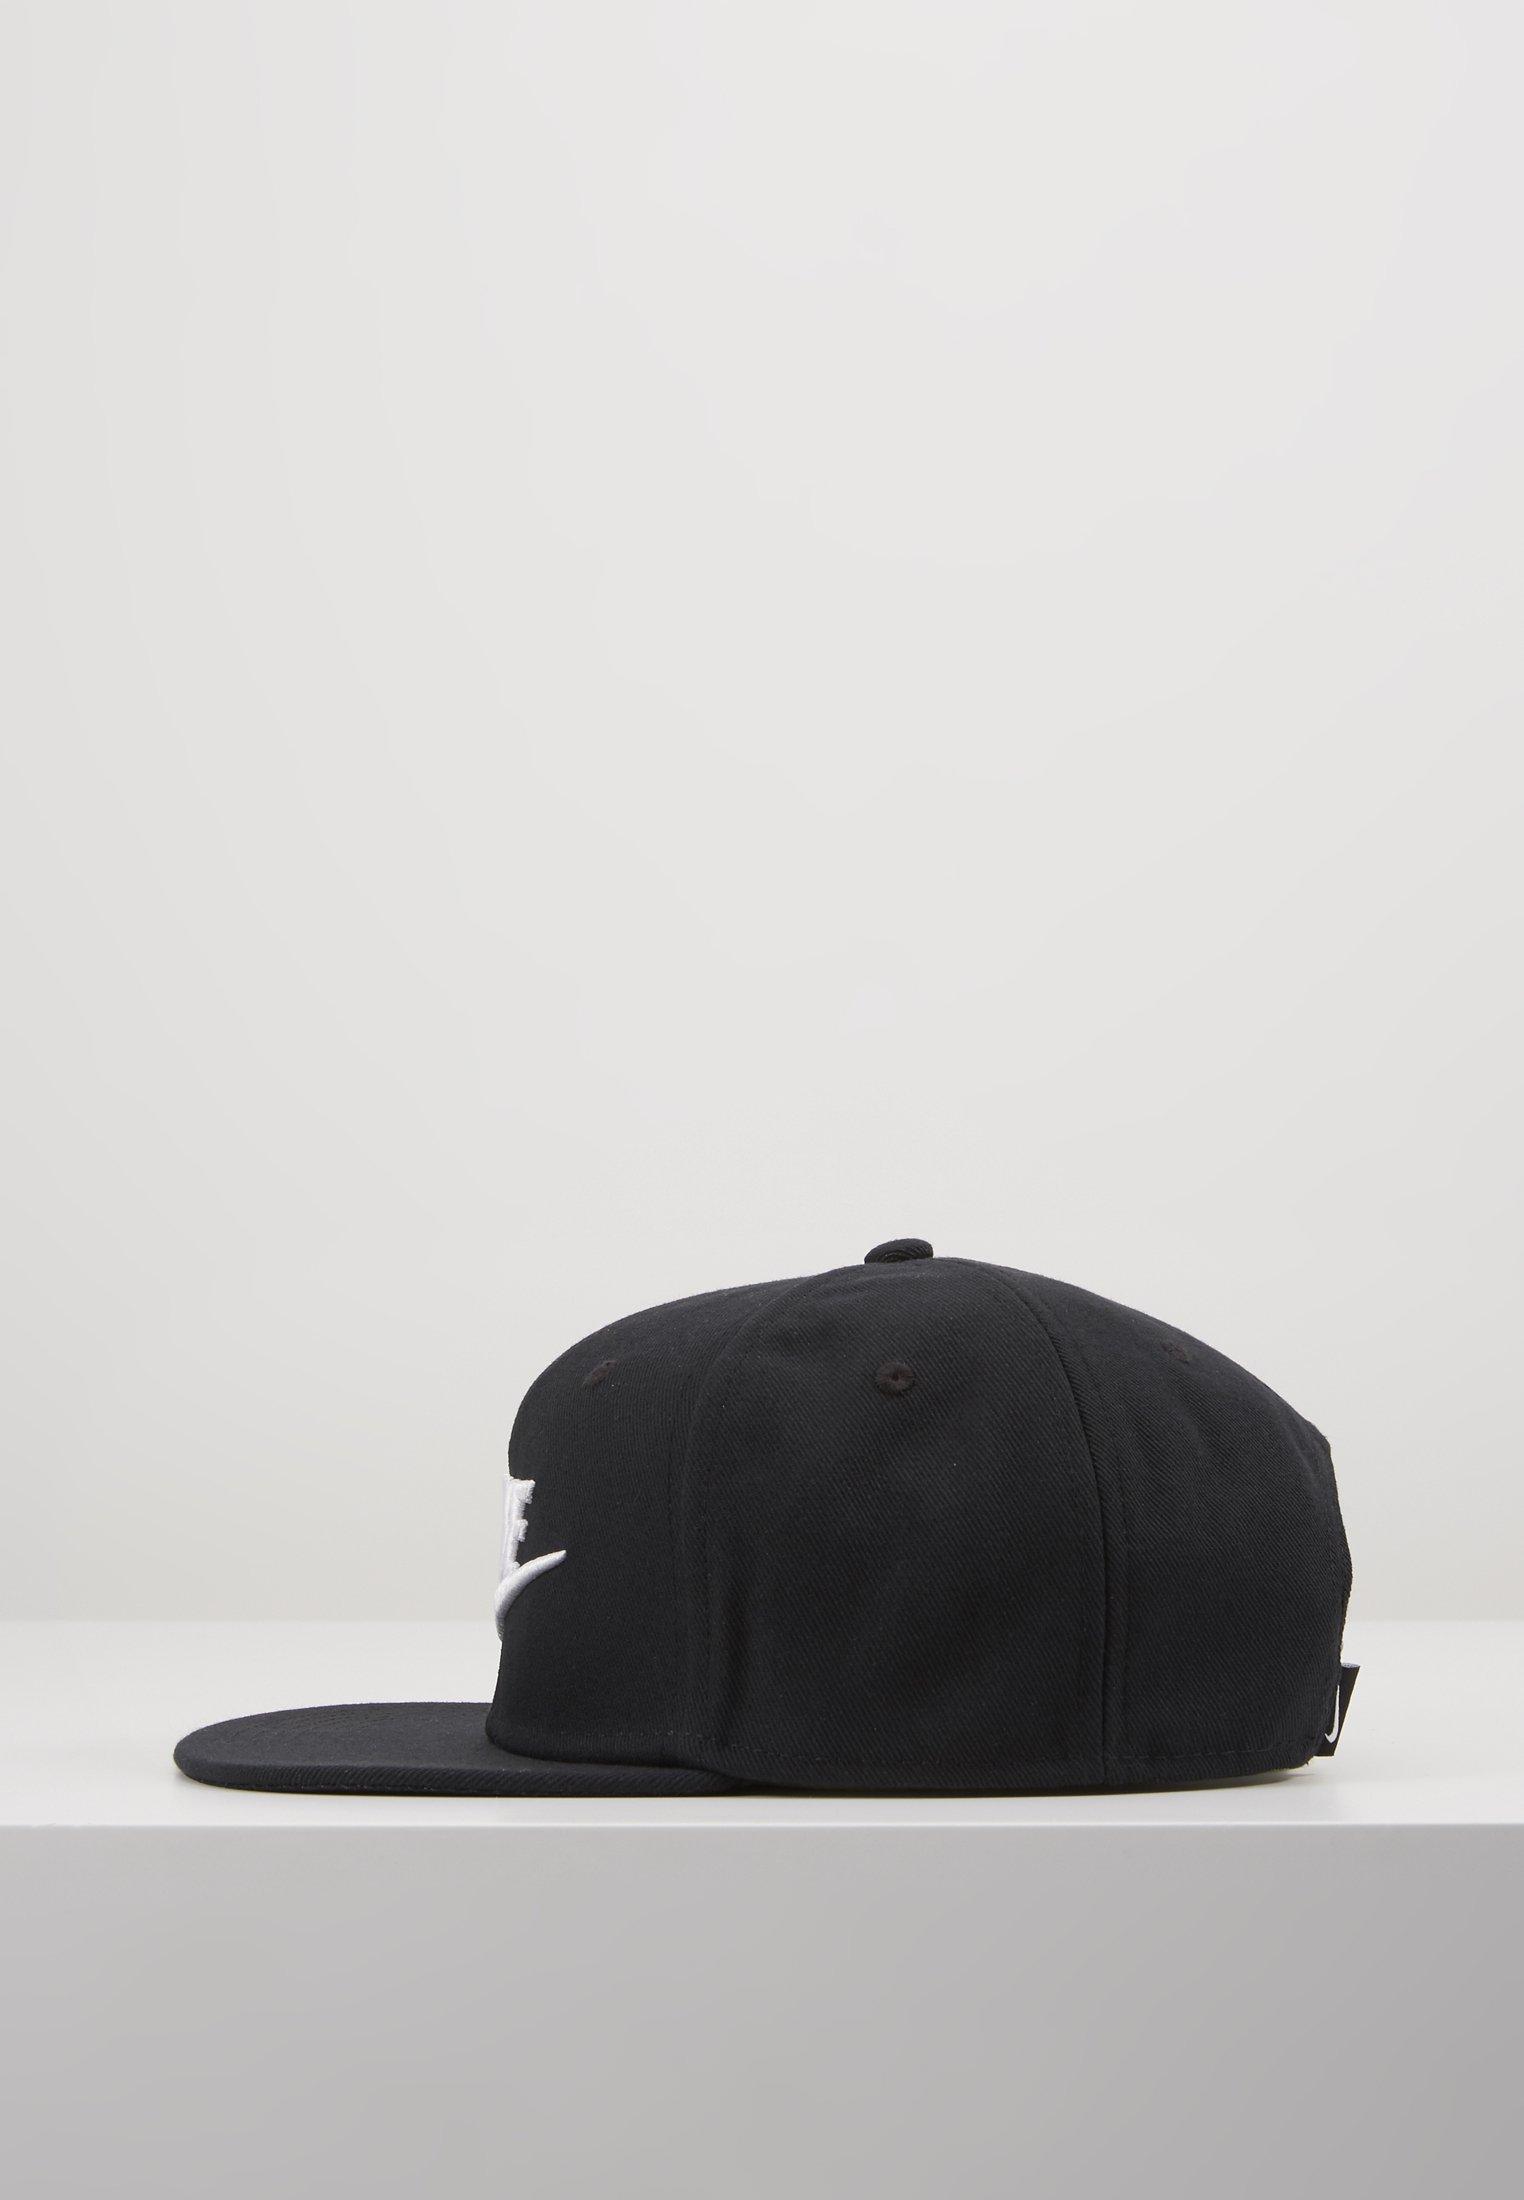 Nike Sportswear PRO FUTURA 4 SNAPBACK - Cap - black/white/svart 205cdLOc4bJvZXv